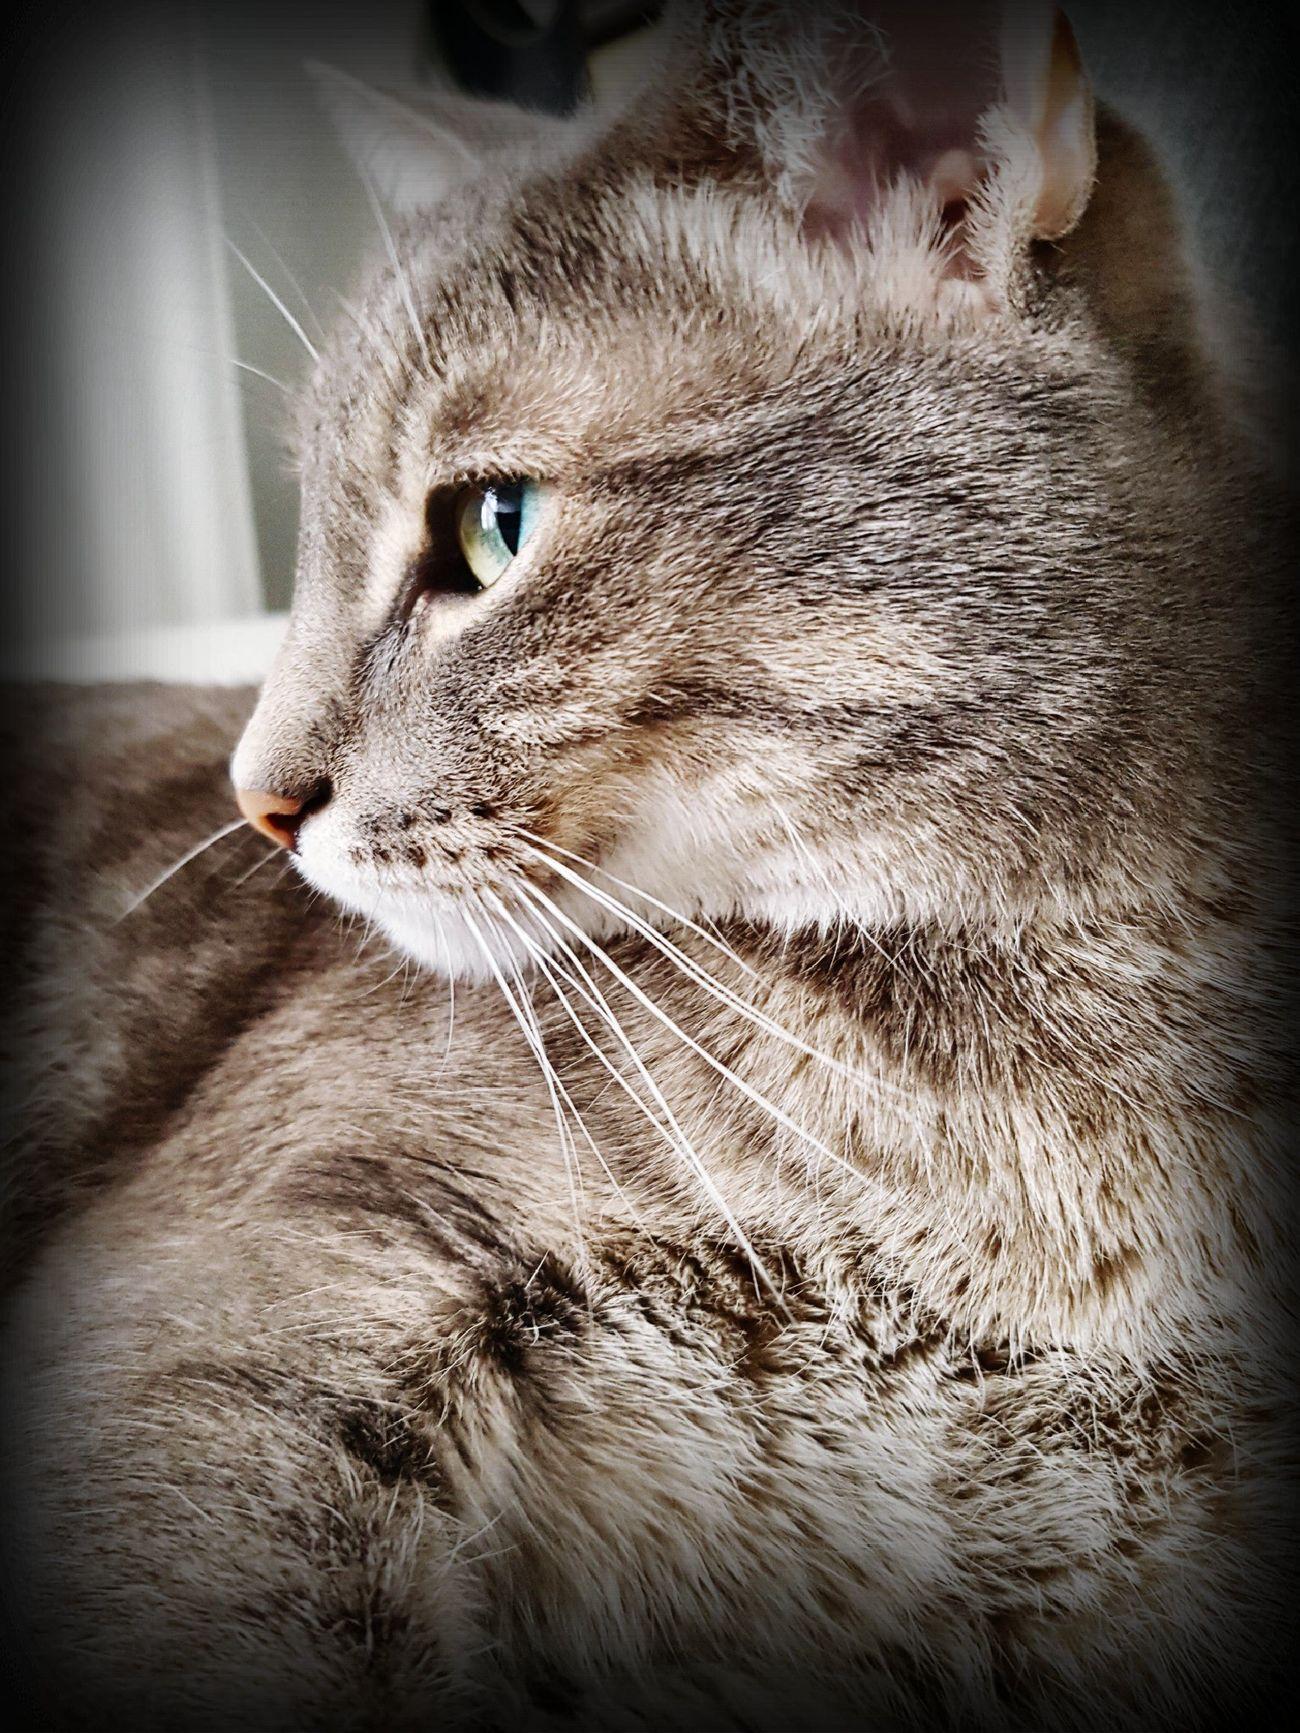 Domestic Cat Catphoto Lovelycat Cateyes Beautifulcat Picoftheday Bestmeow Amourdechat DouceurHome First Eyeem Photo